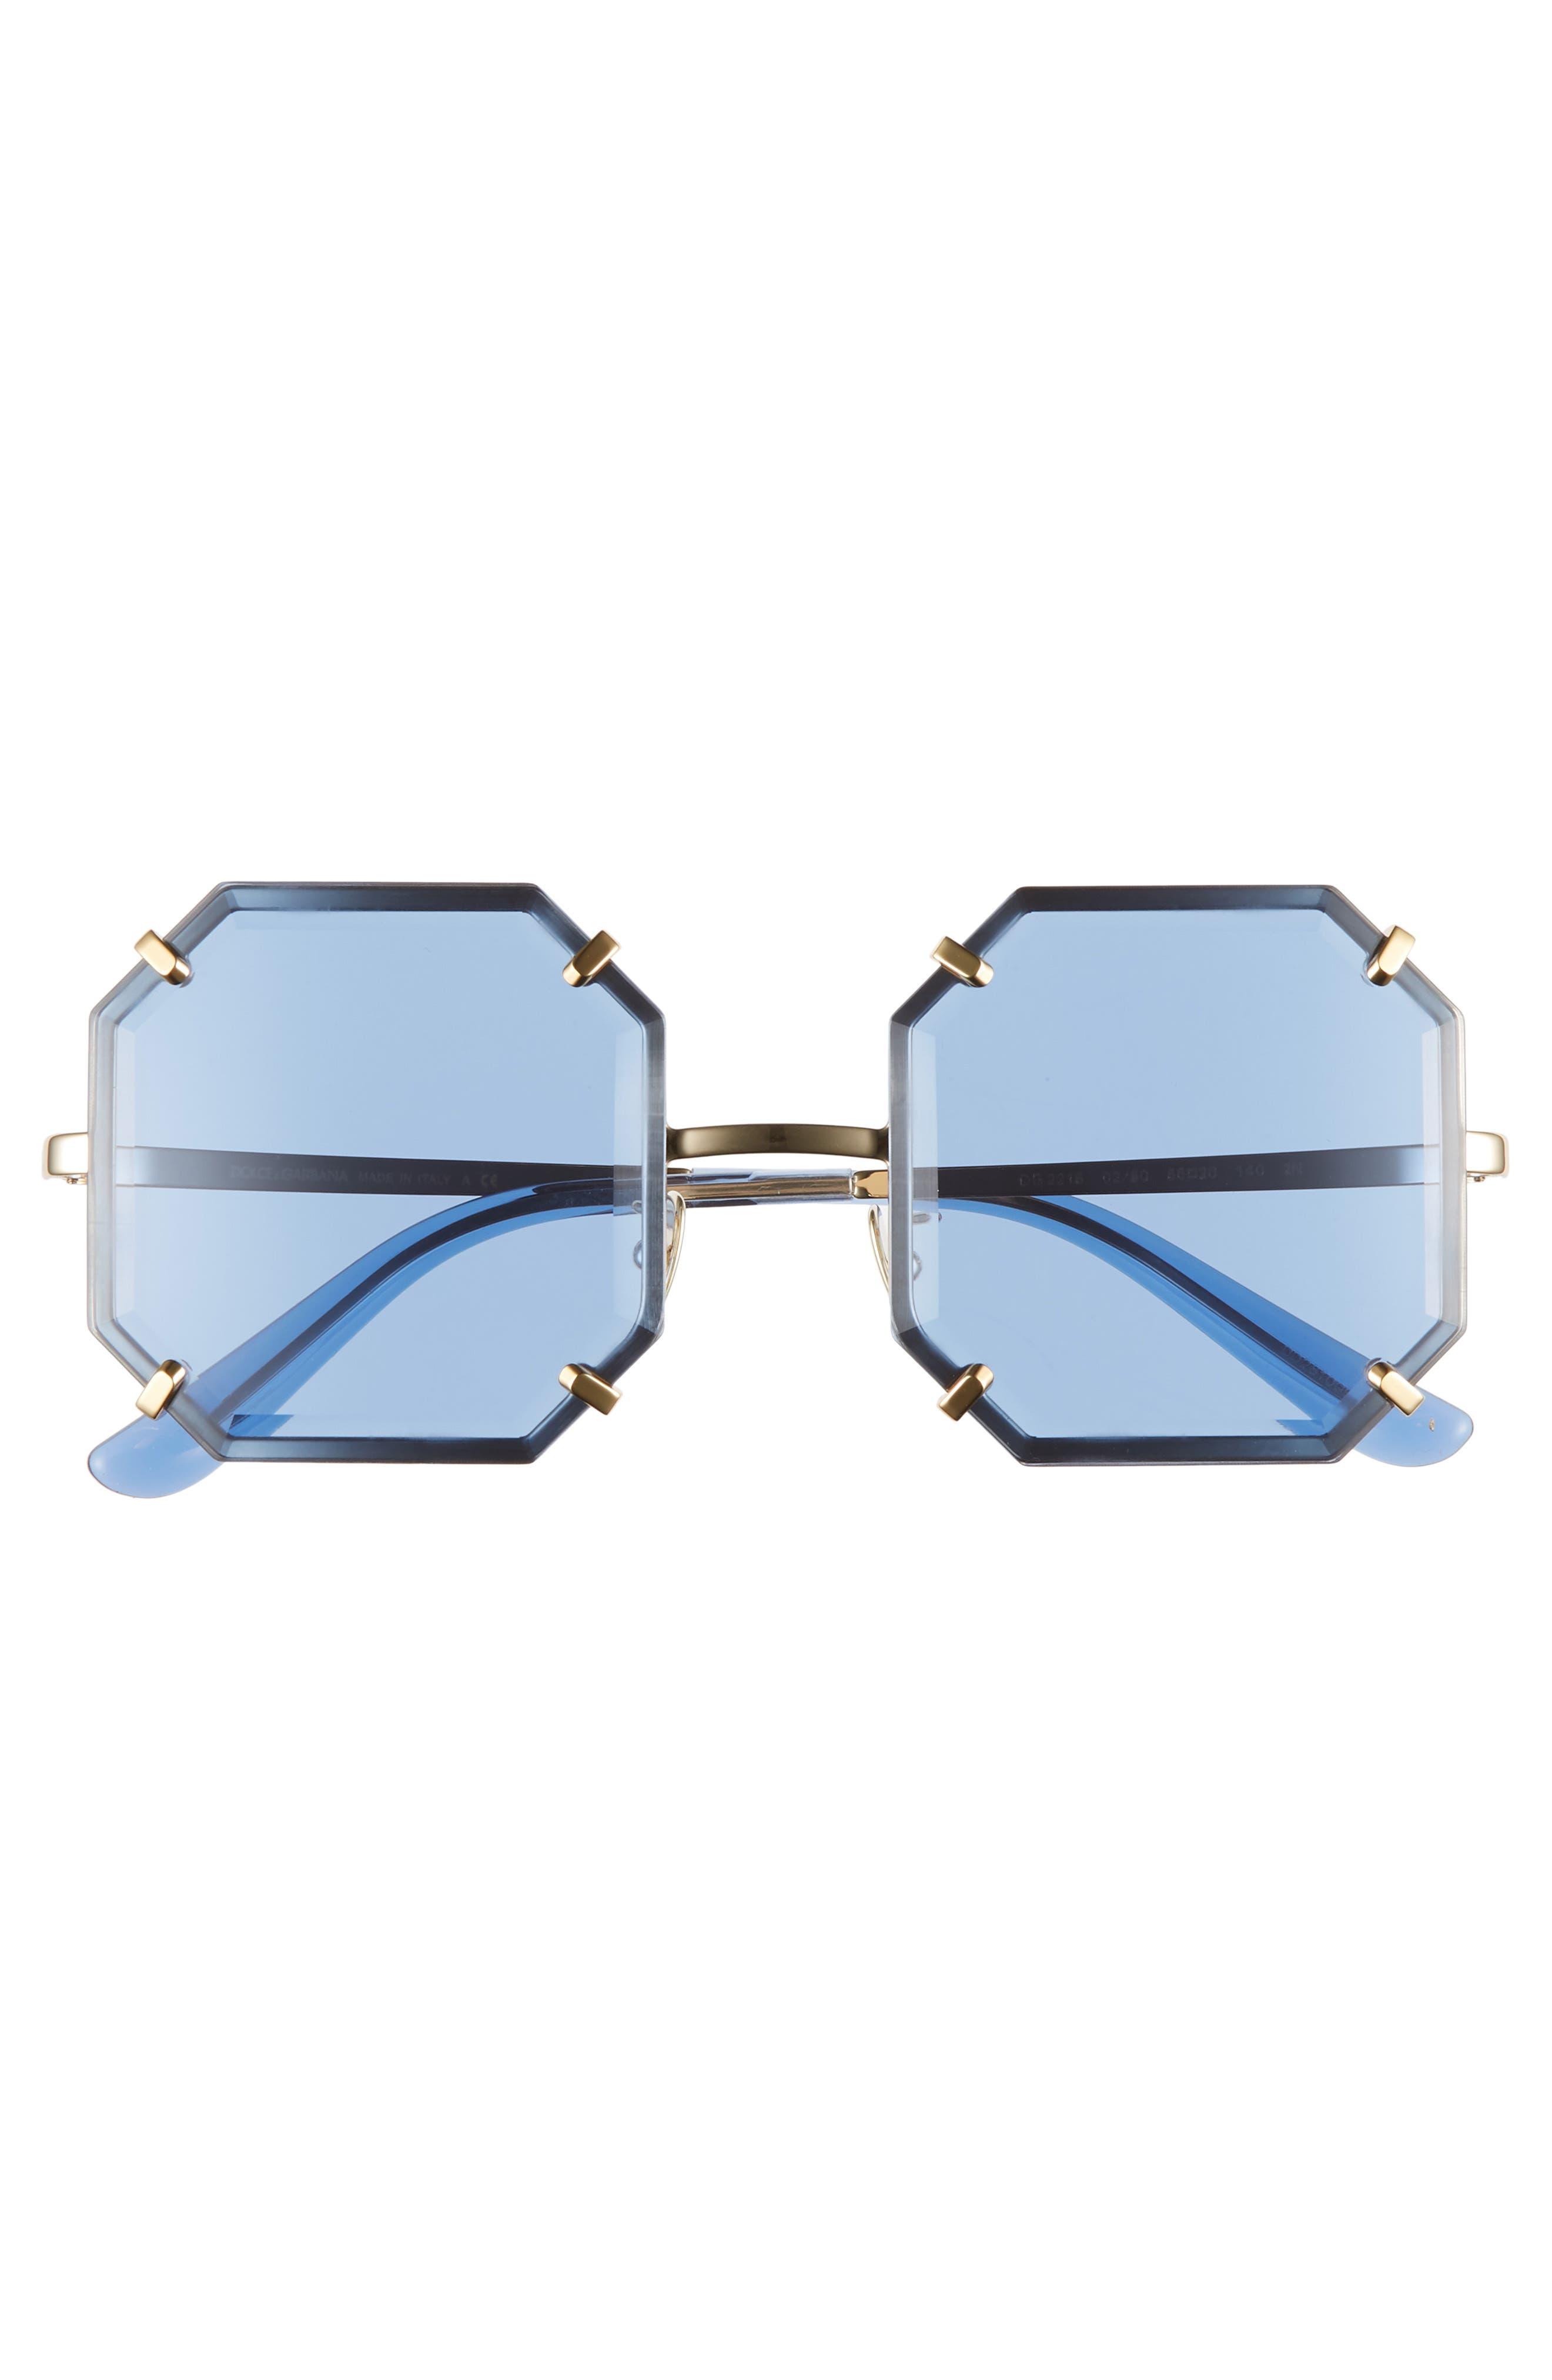 Jewel 55mm Octagonal Sunglasses,                             Alternate thumbnail 3, color,                             SILVER/ BLUE SOLID